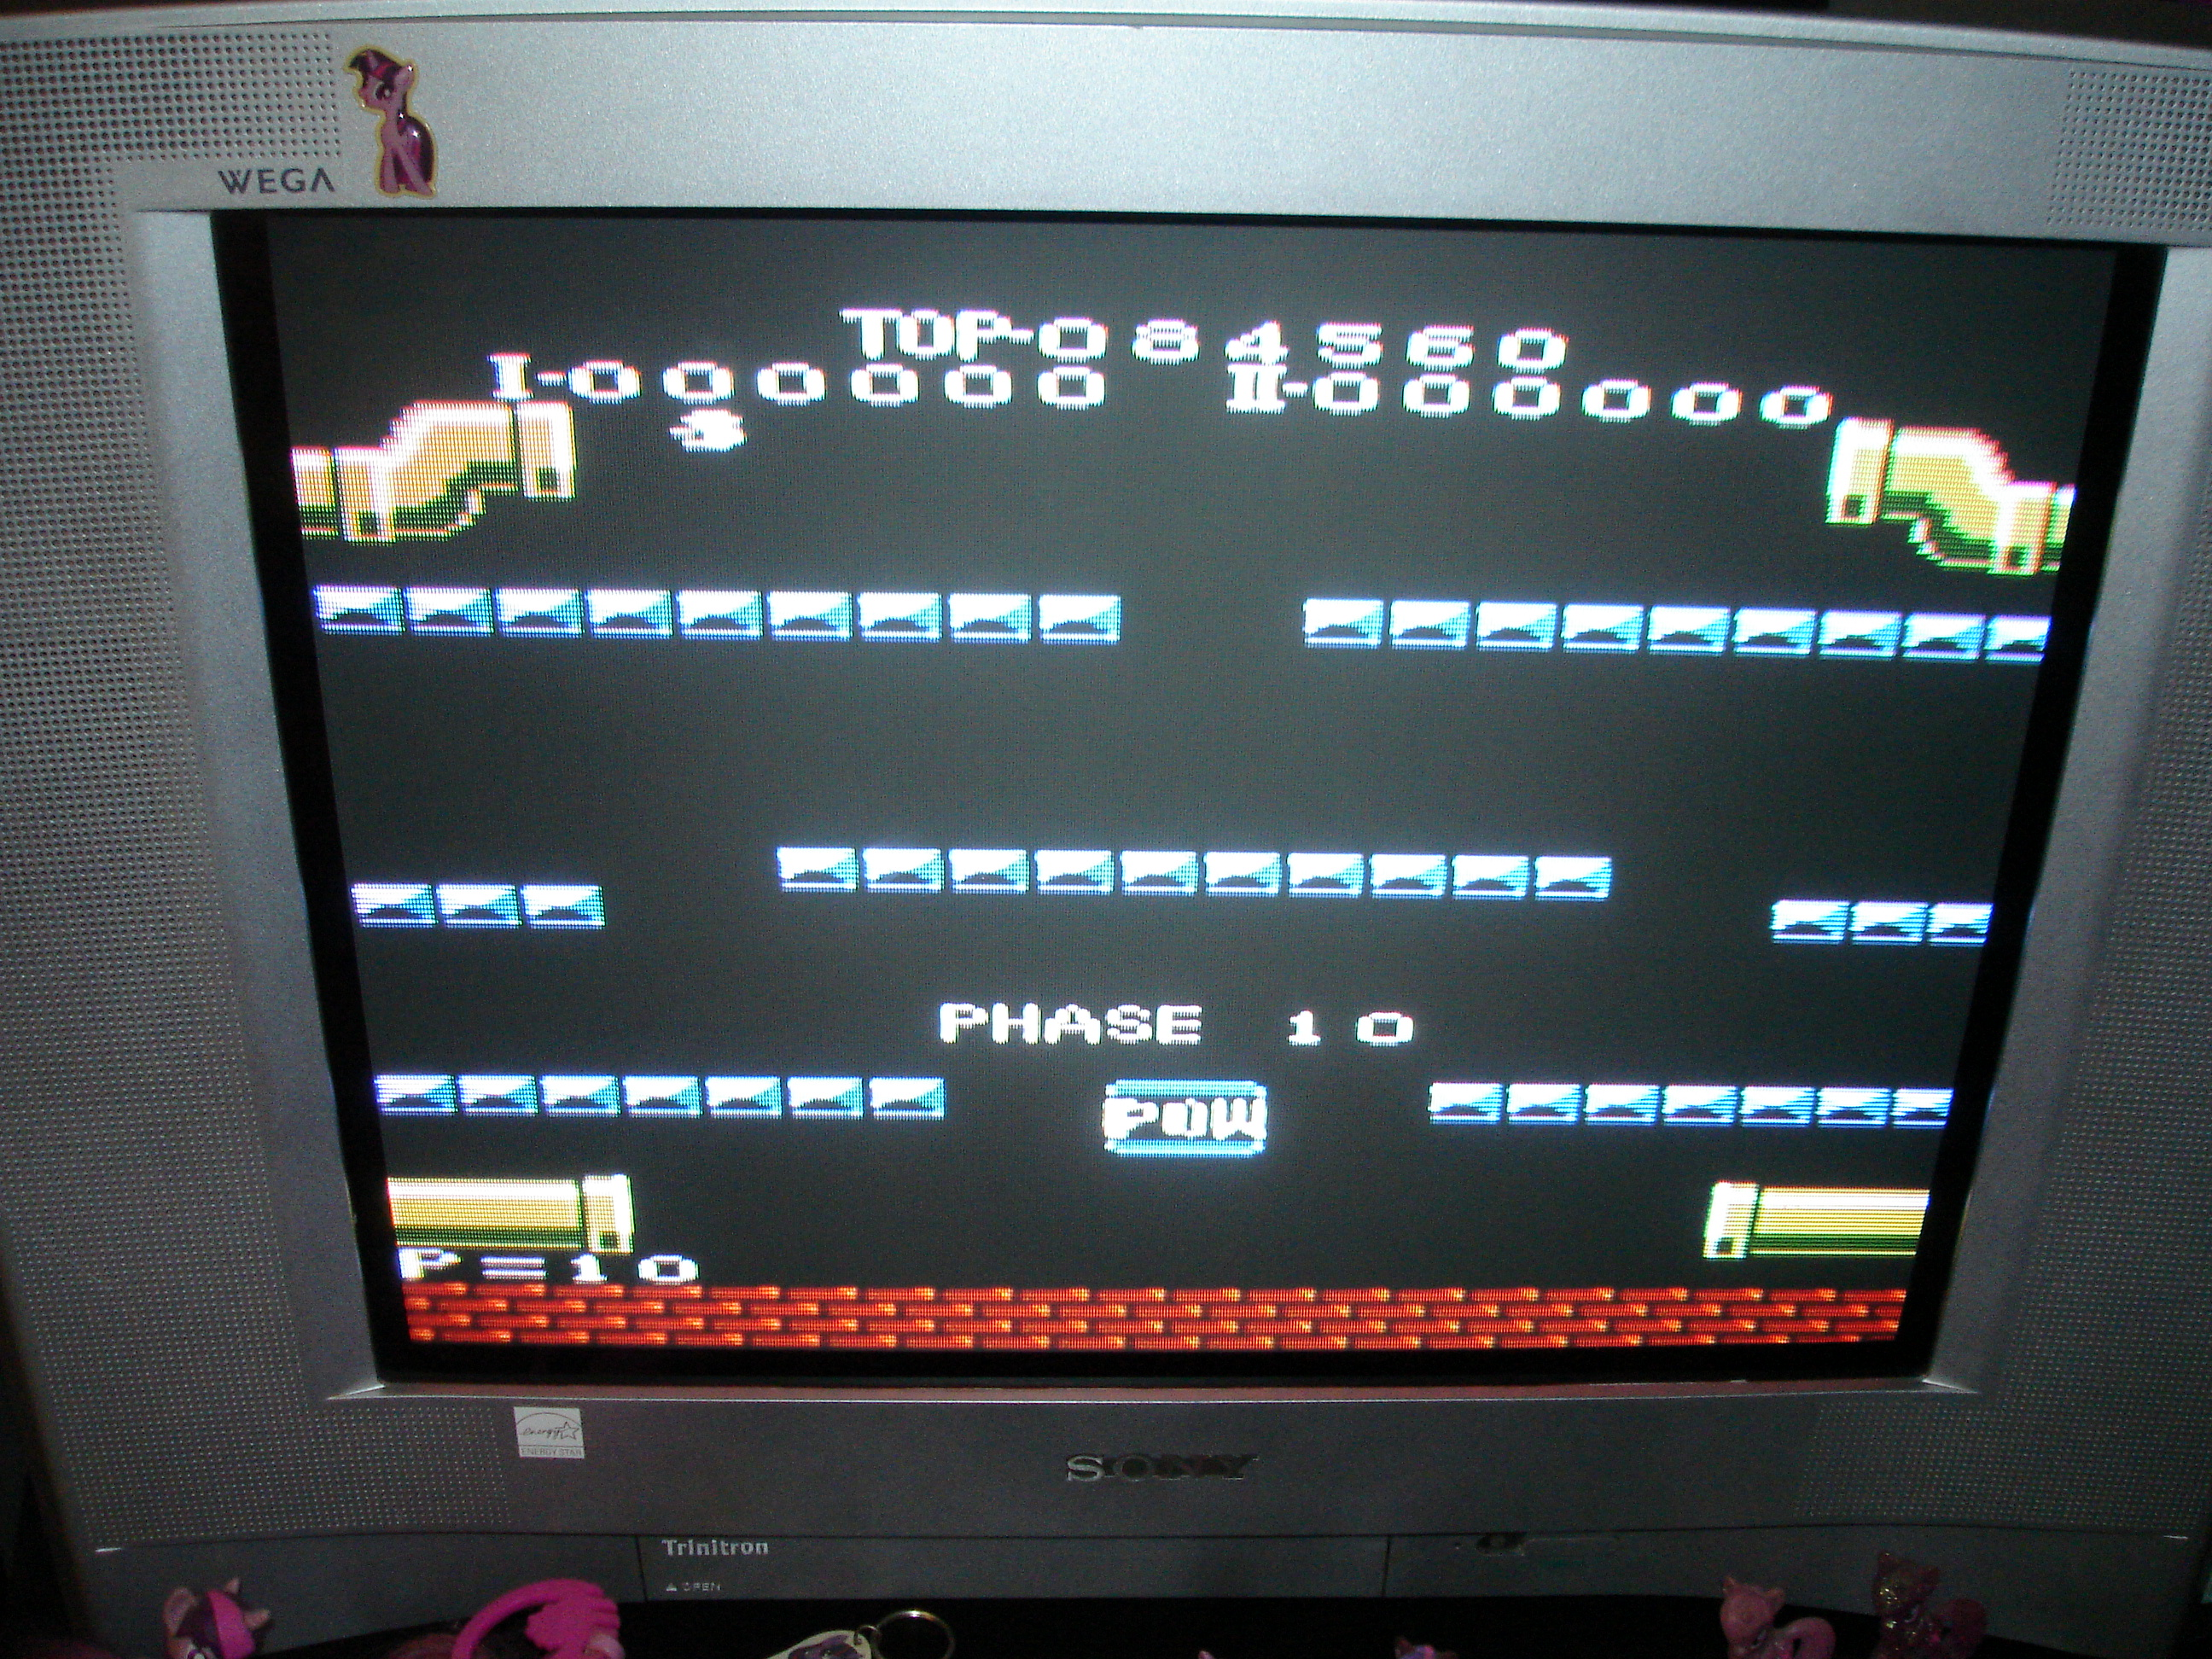 Mario Bros. [Standard] 84,560 points